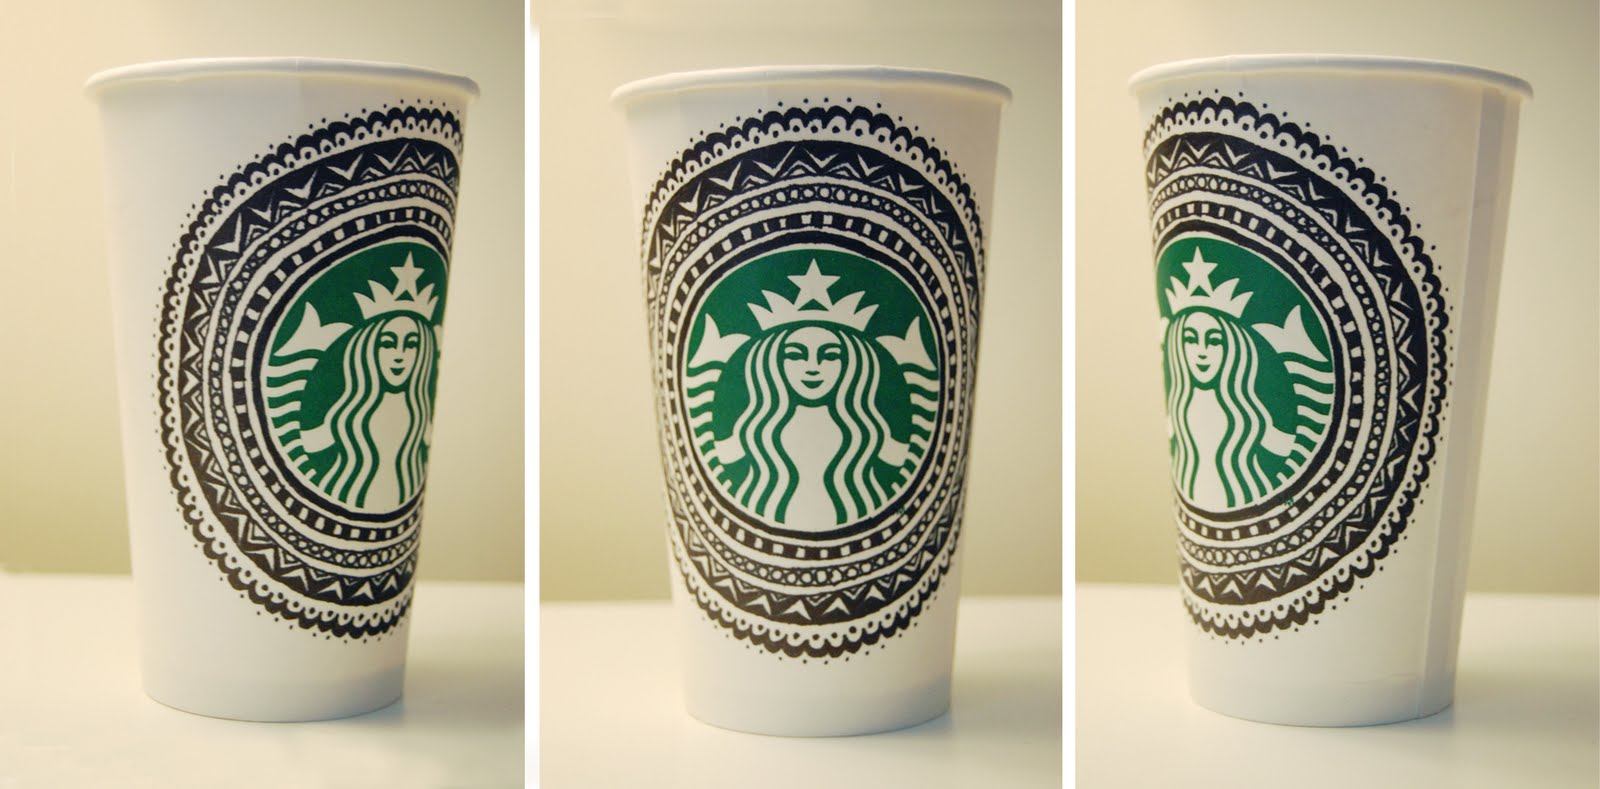 Drawn starbucks doodle Drawing Cup  Starbucks